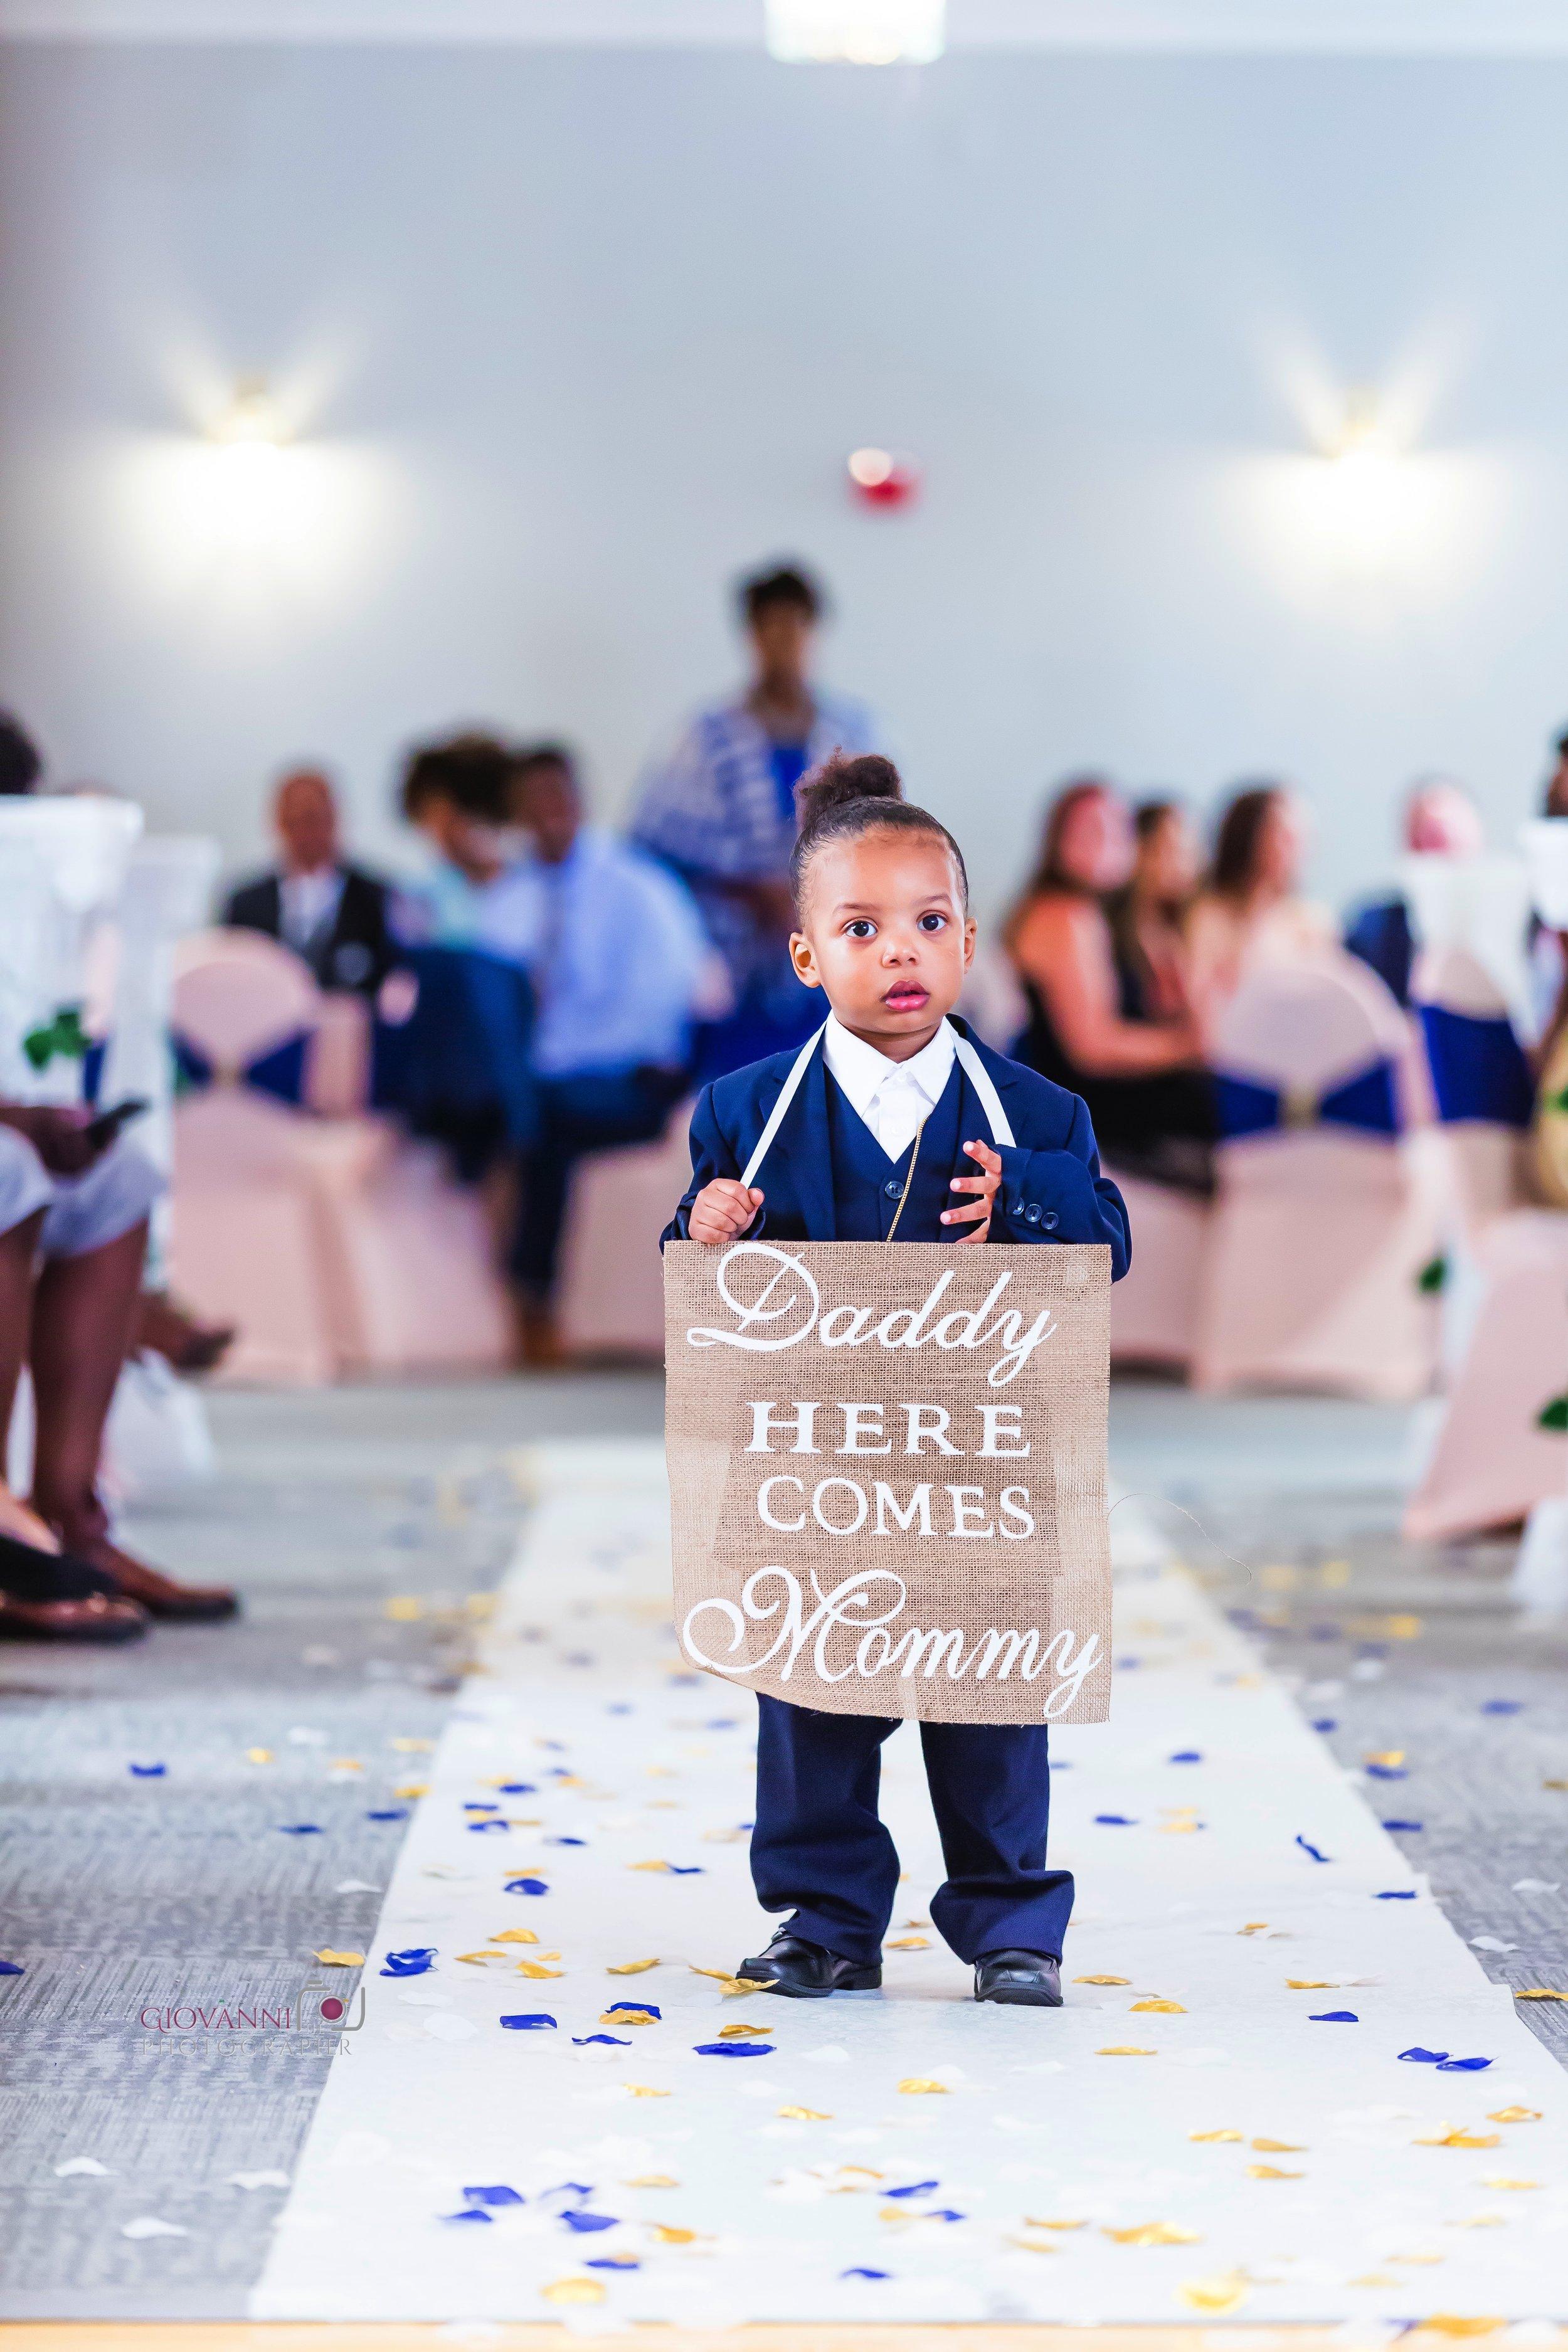 314A0384-Giovanni The Photographer-Best Boston Wedding Photography-Randolph Elks 2130 WM50.jpg